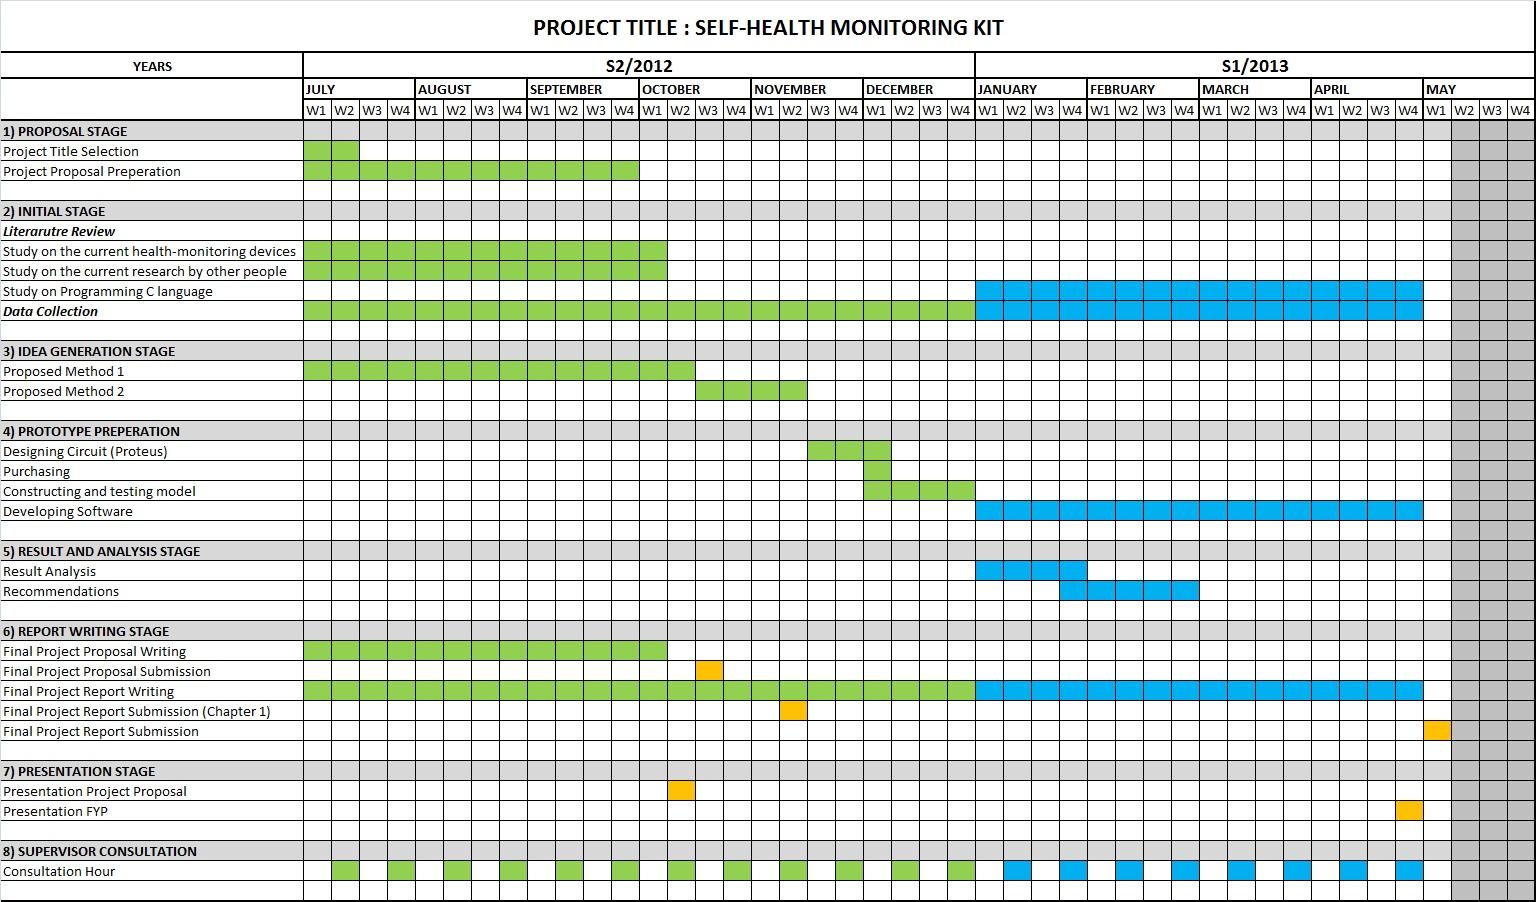 Development of self health monitoring kit work plan